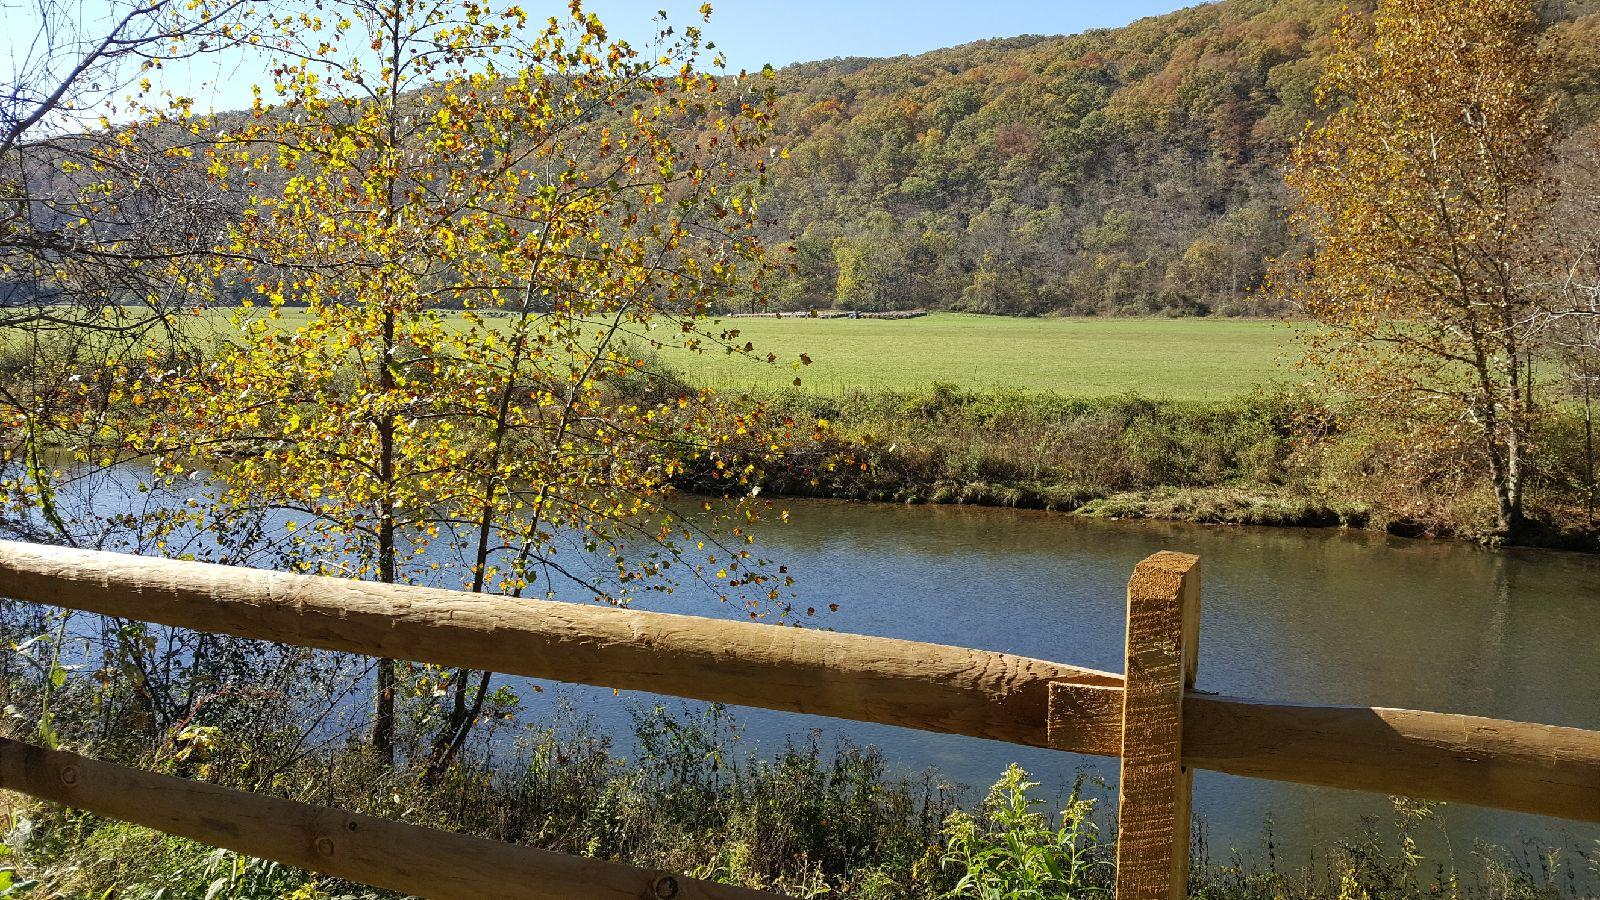 Jackson River Scenic Trail 10-27-17